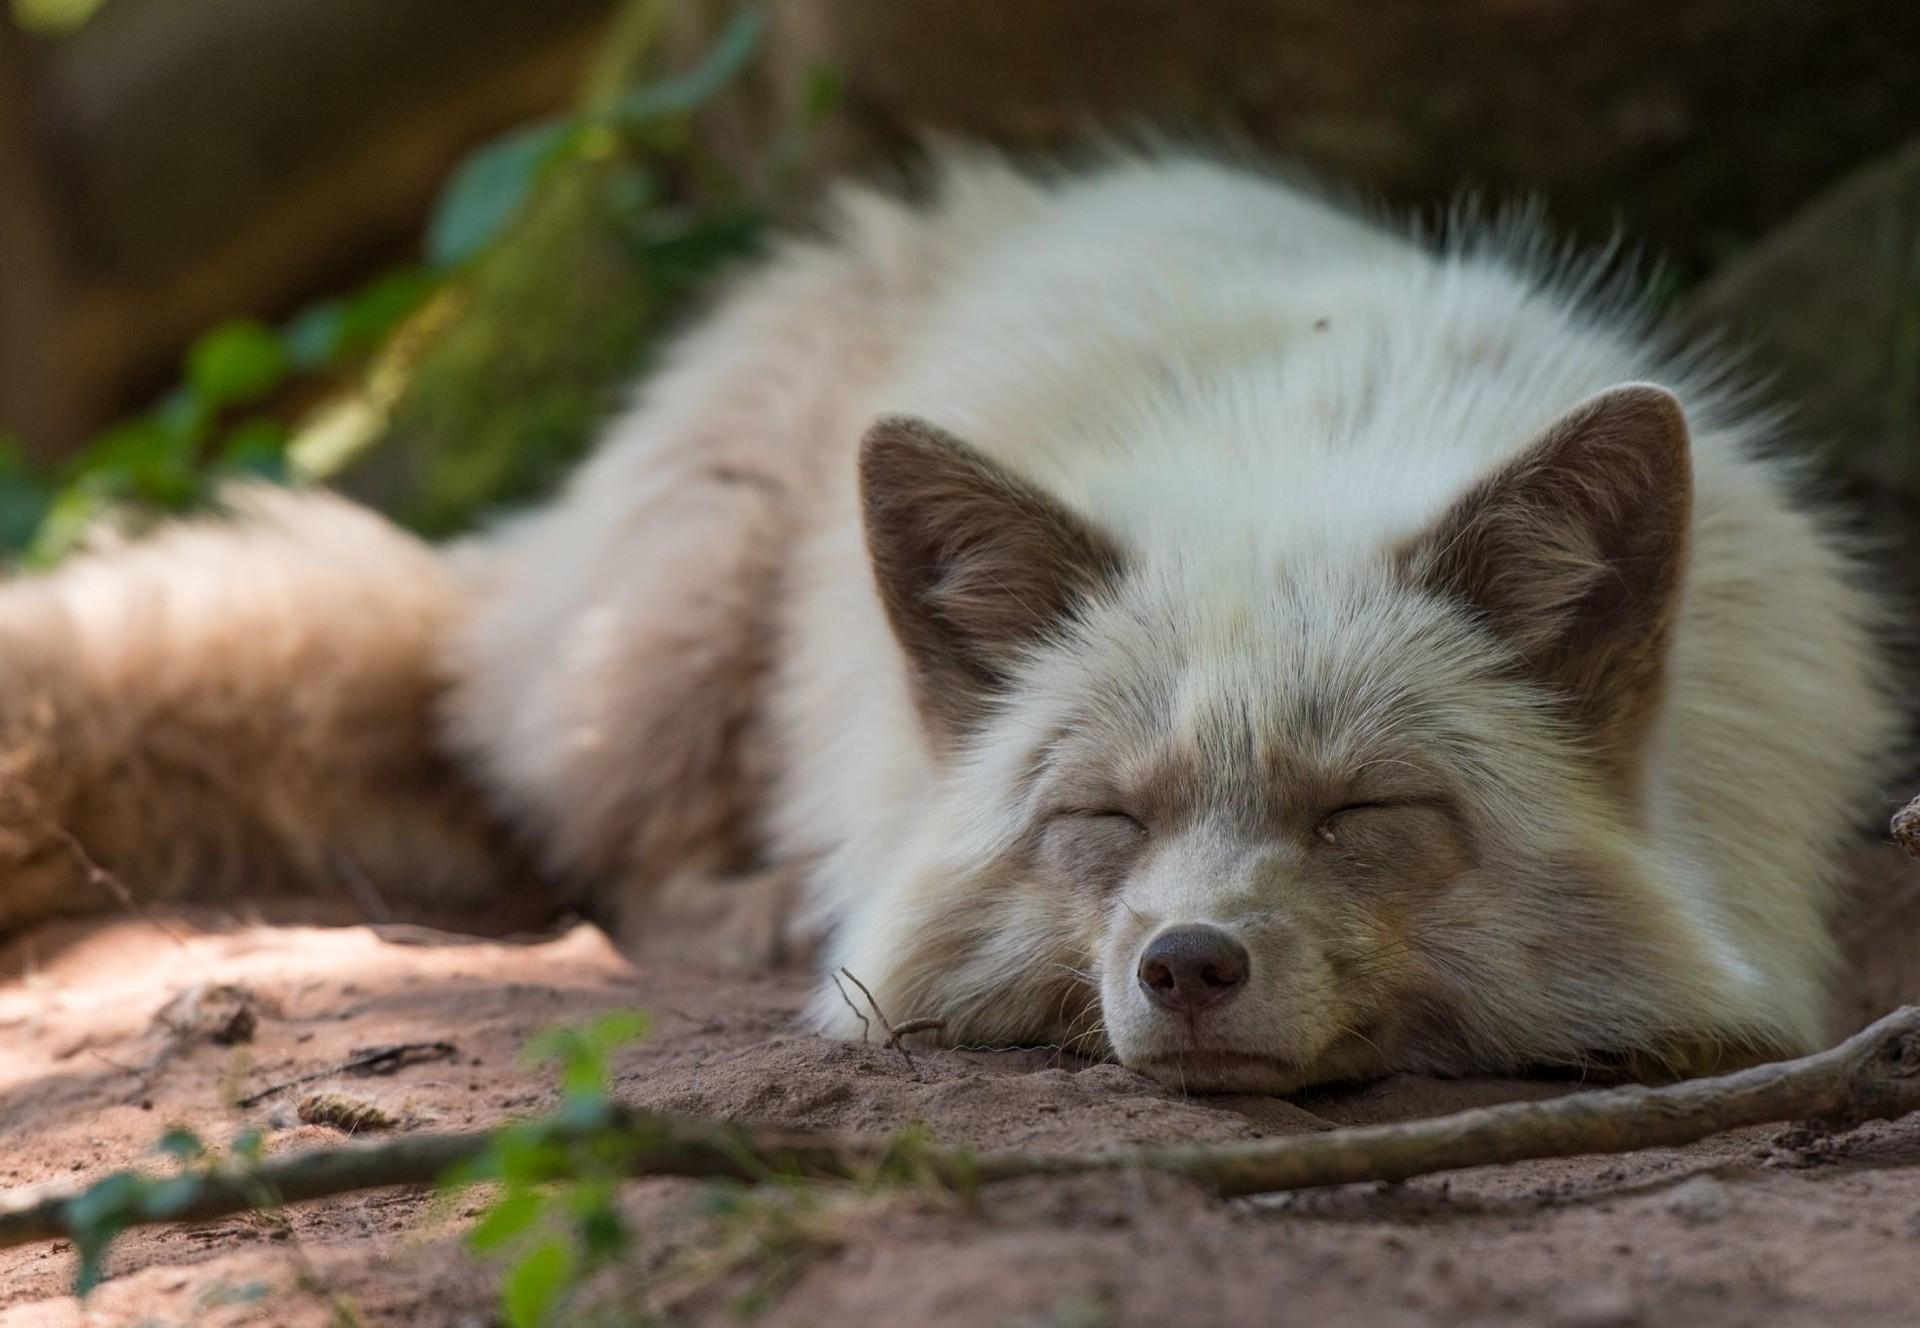 fox-wooden-stick